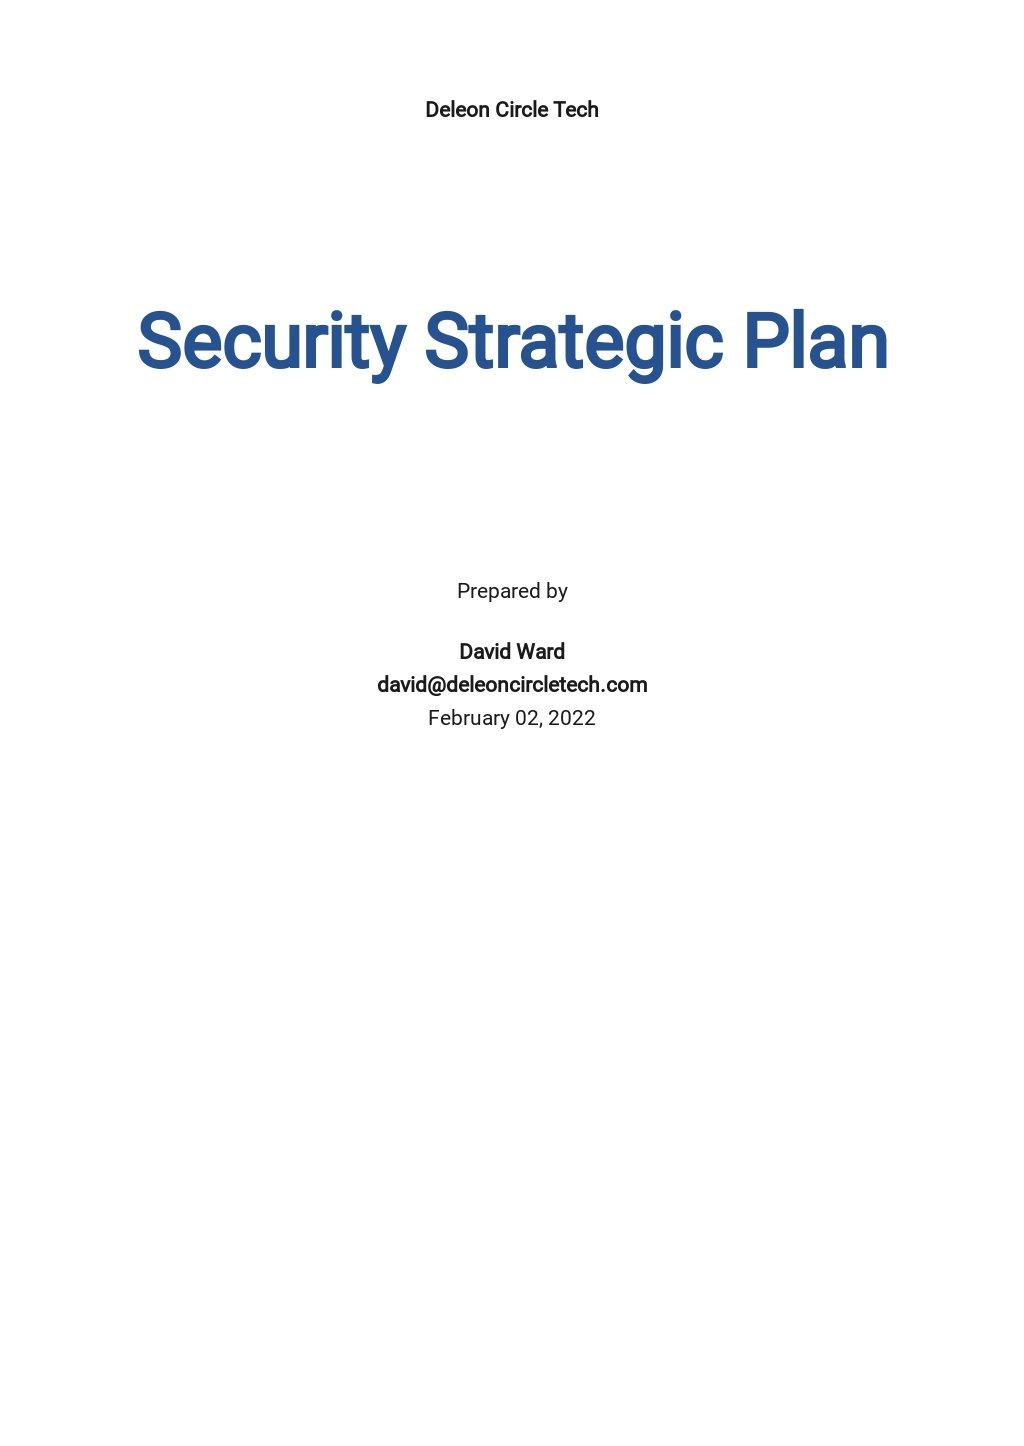 Security Strategic Plan Template.jpe